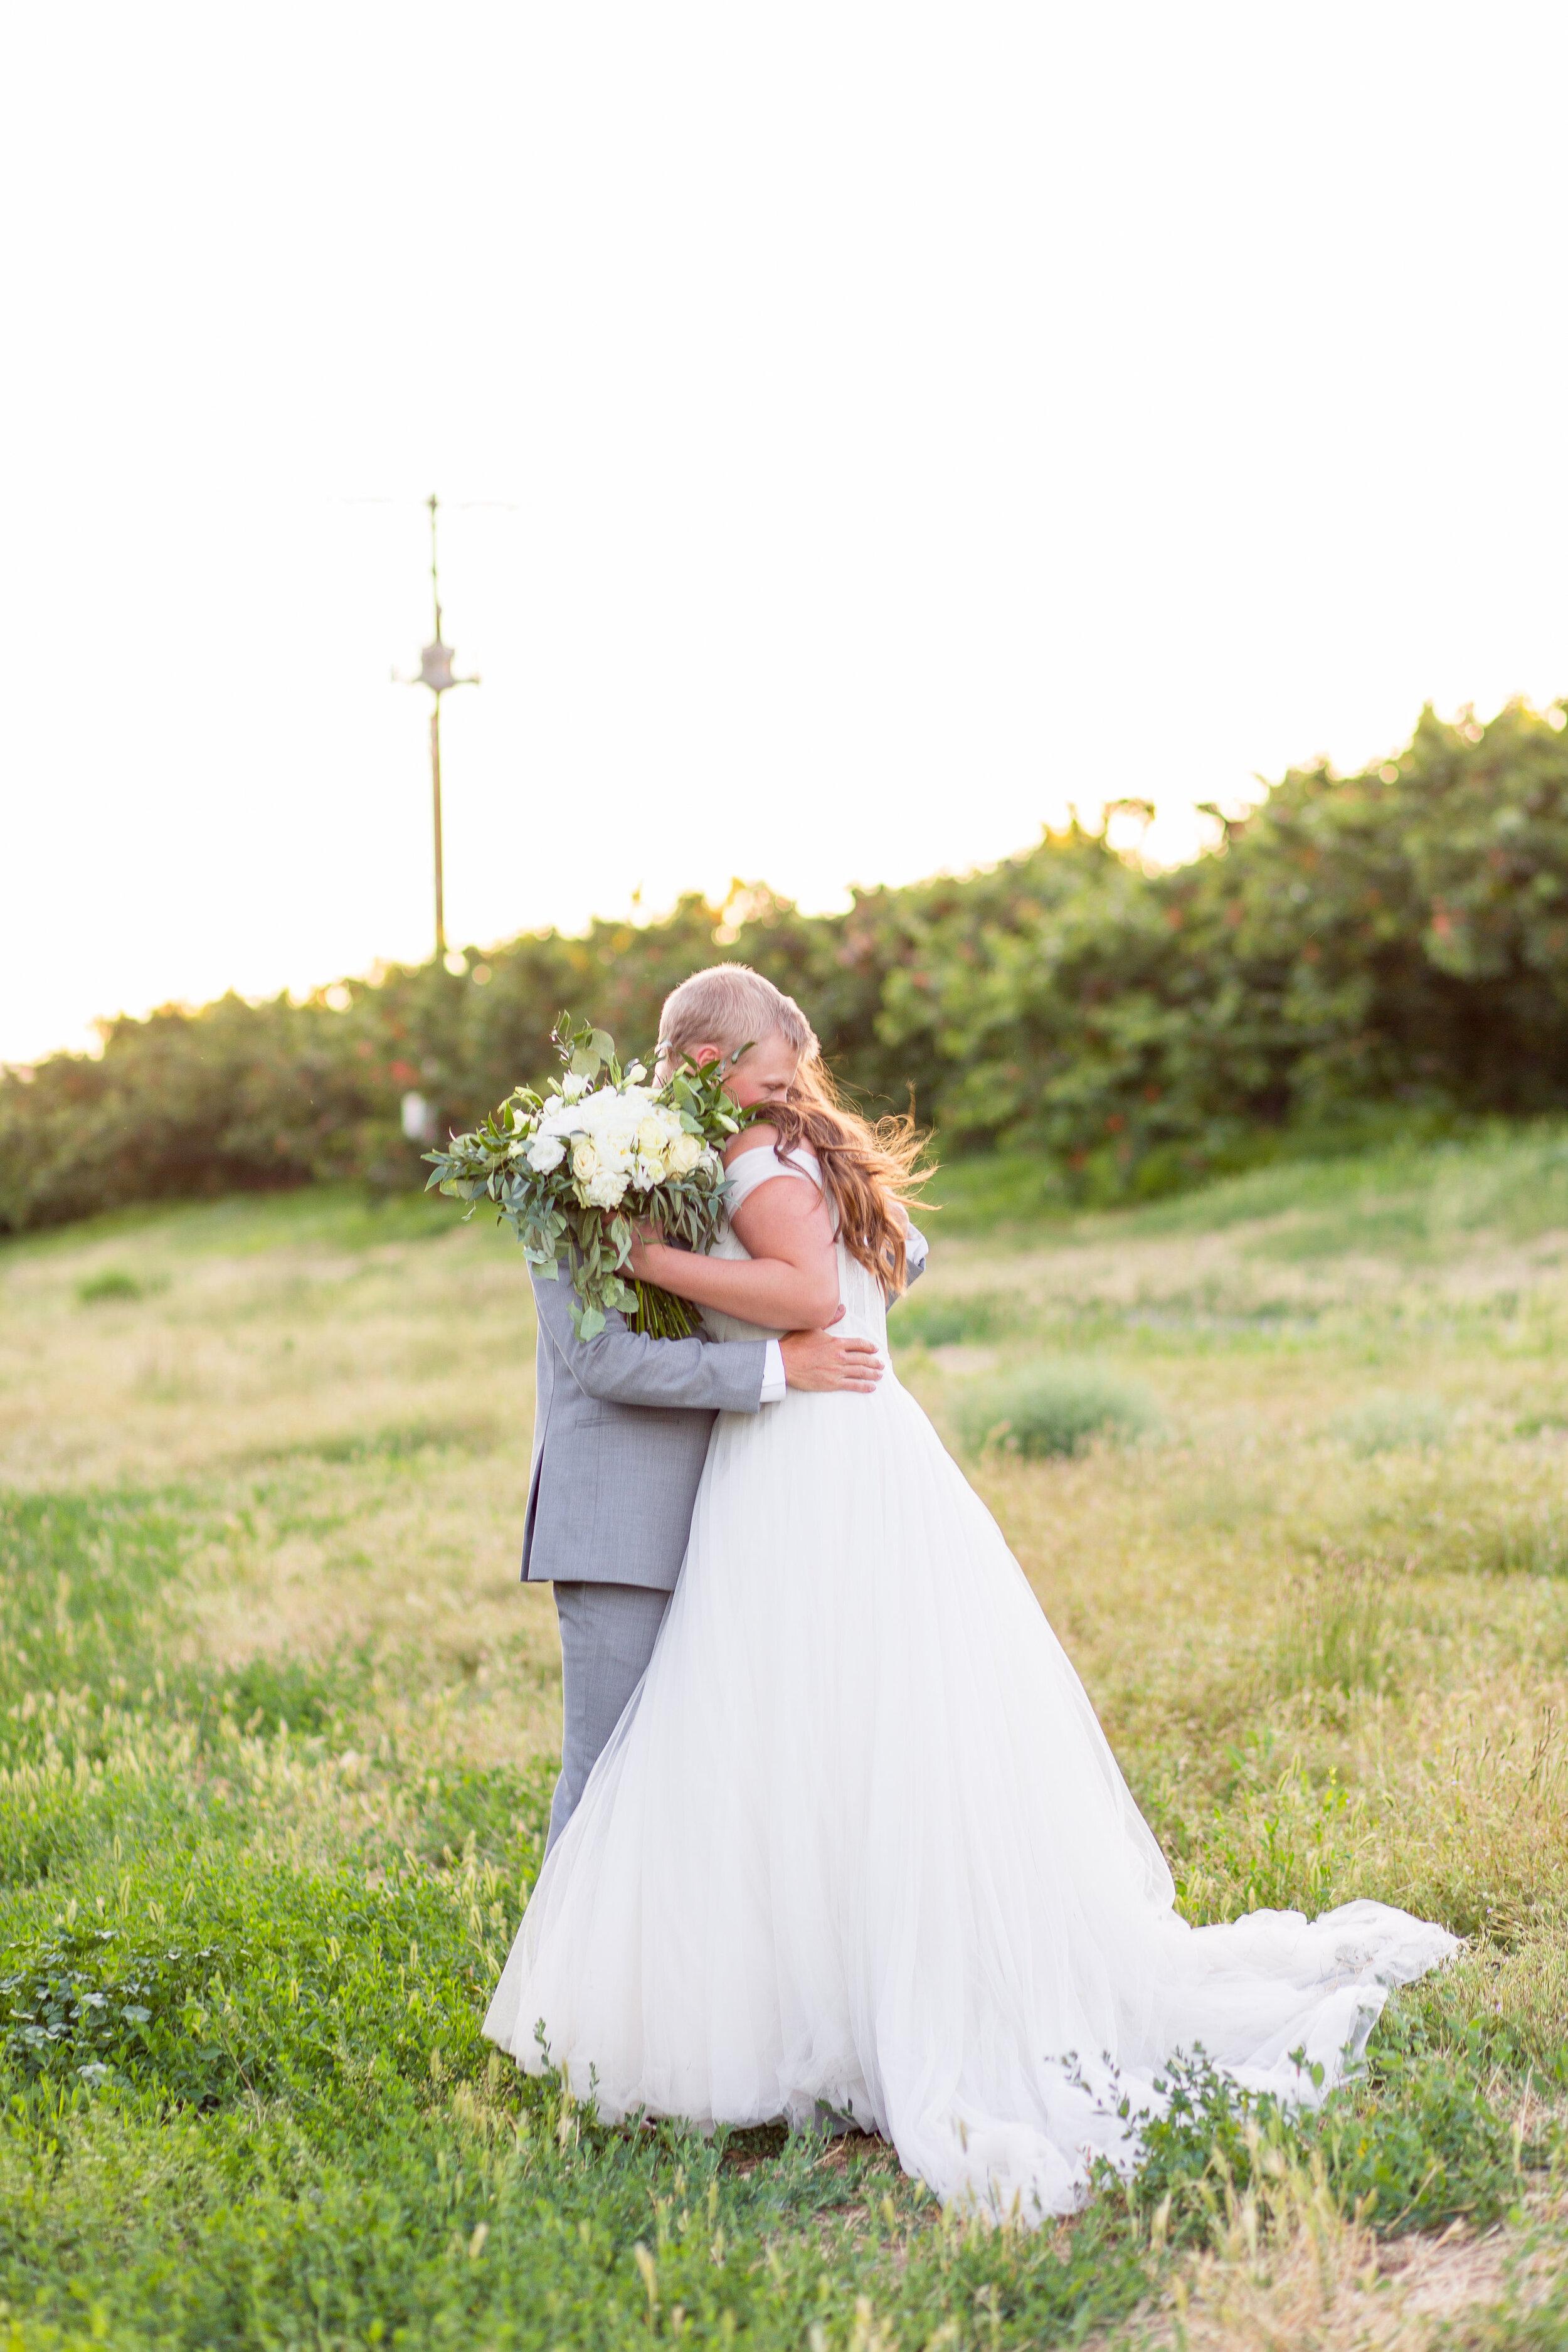 bride and groom dancing together spokane wedding